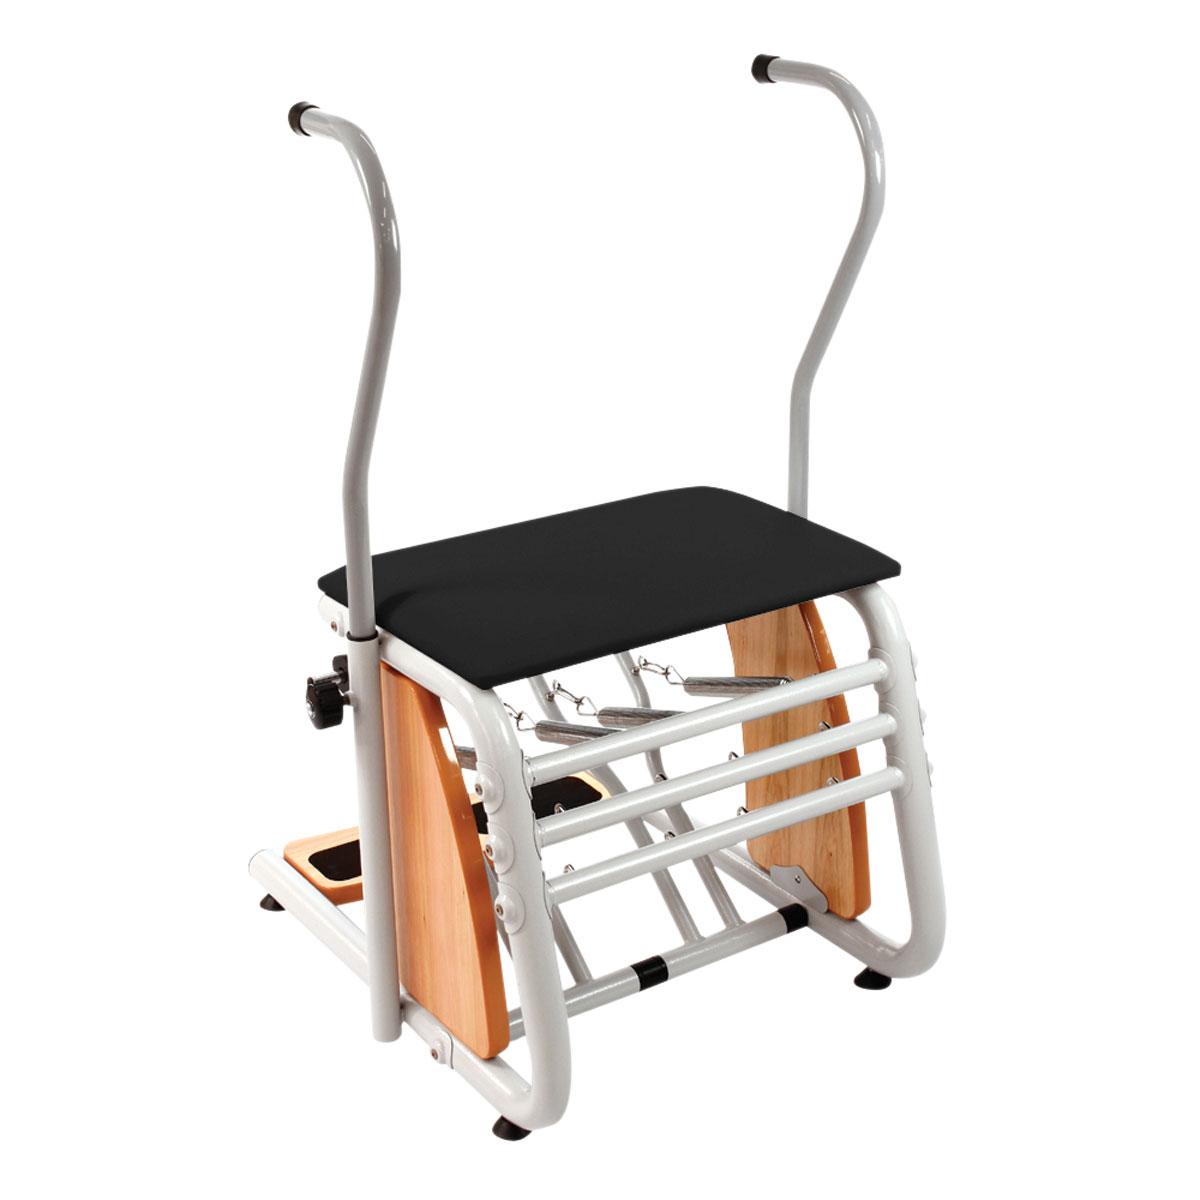 chair stool combo dining room covers amazon uk stark pilates 3b scientific w15401